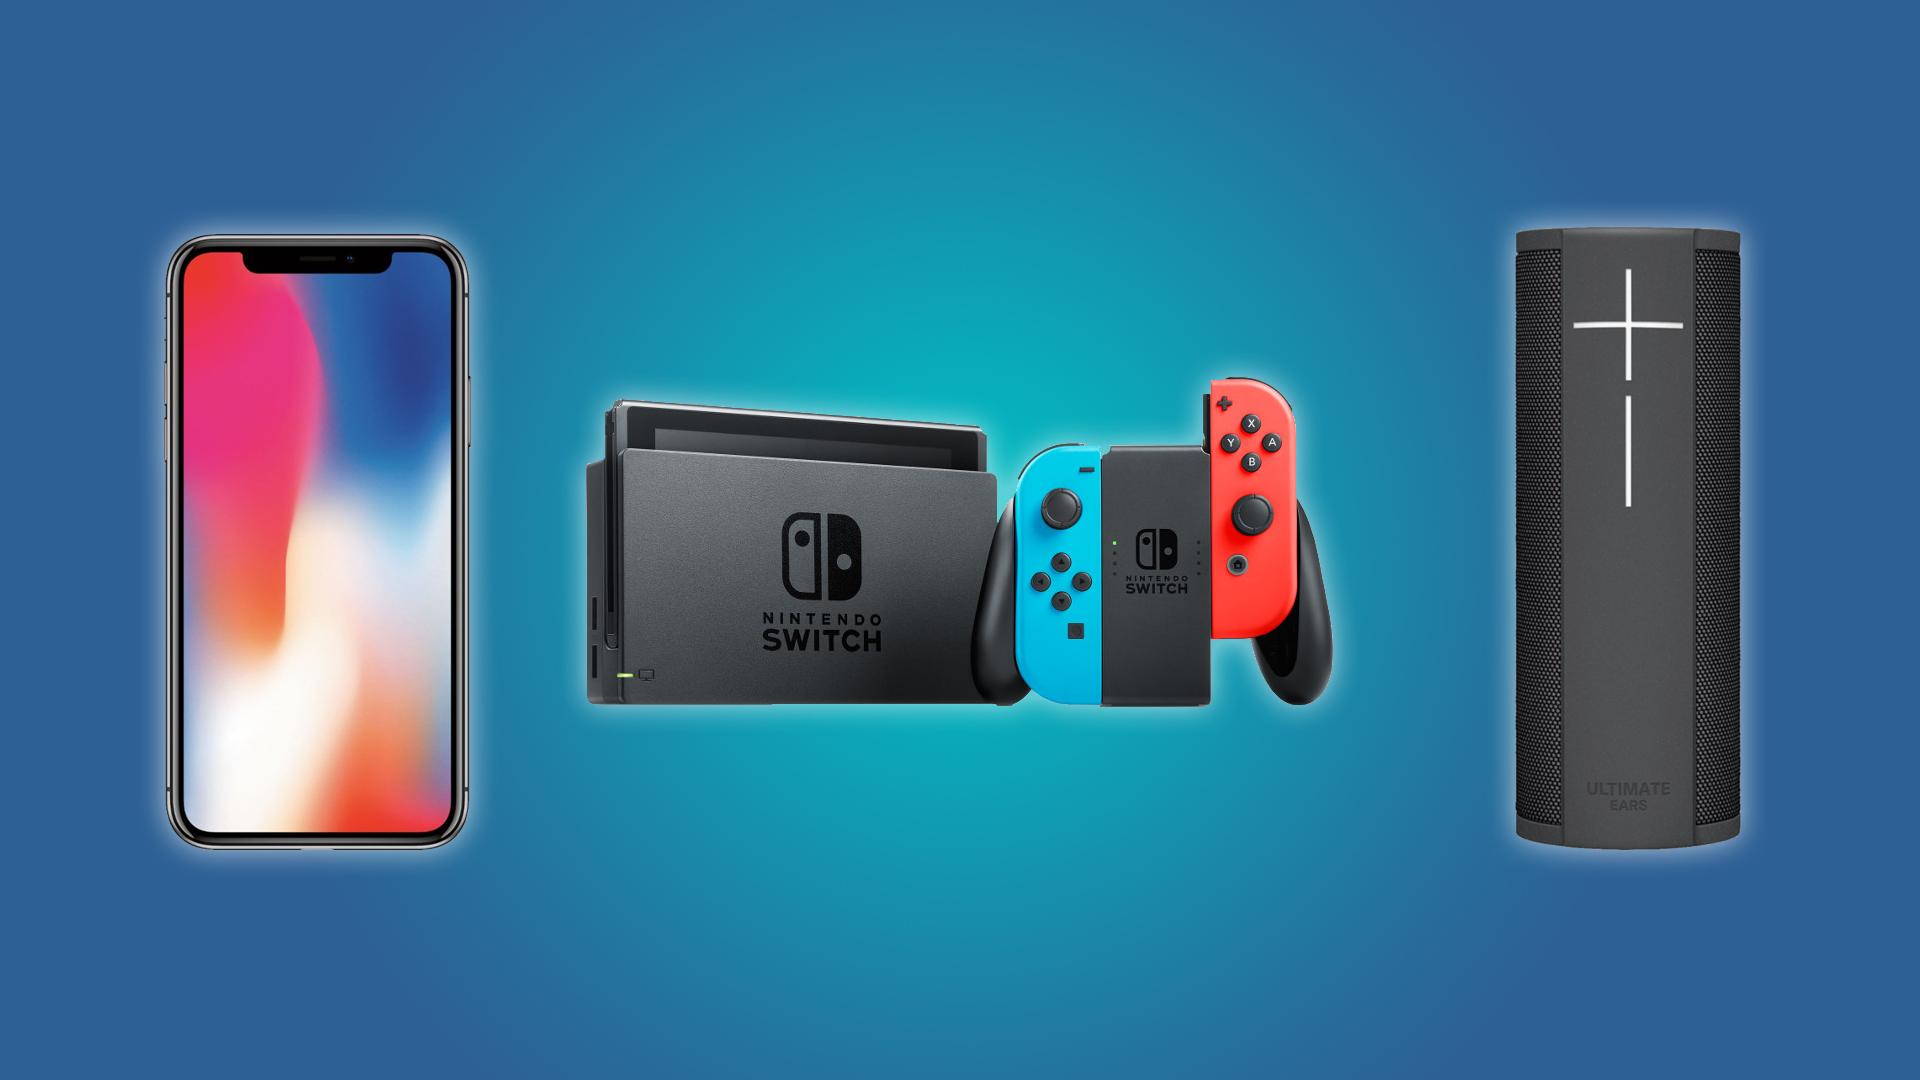 Daily Deals A 263 Nintendo Switch A 675 Iphone X An 80